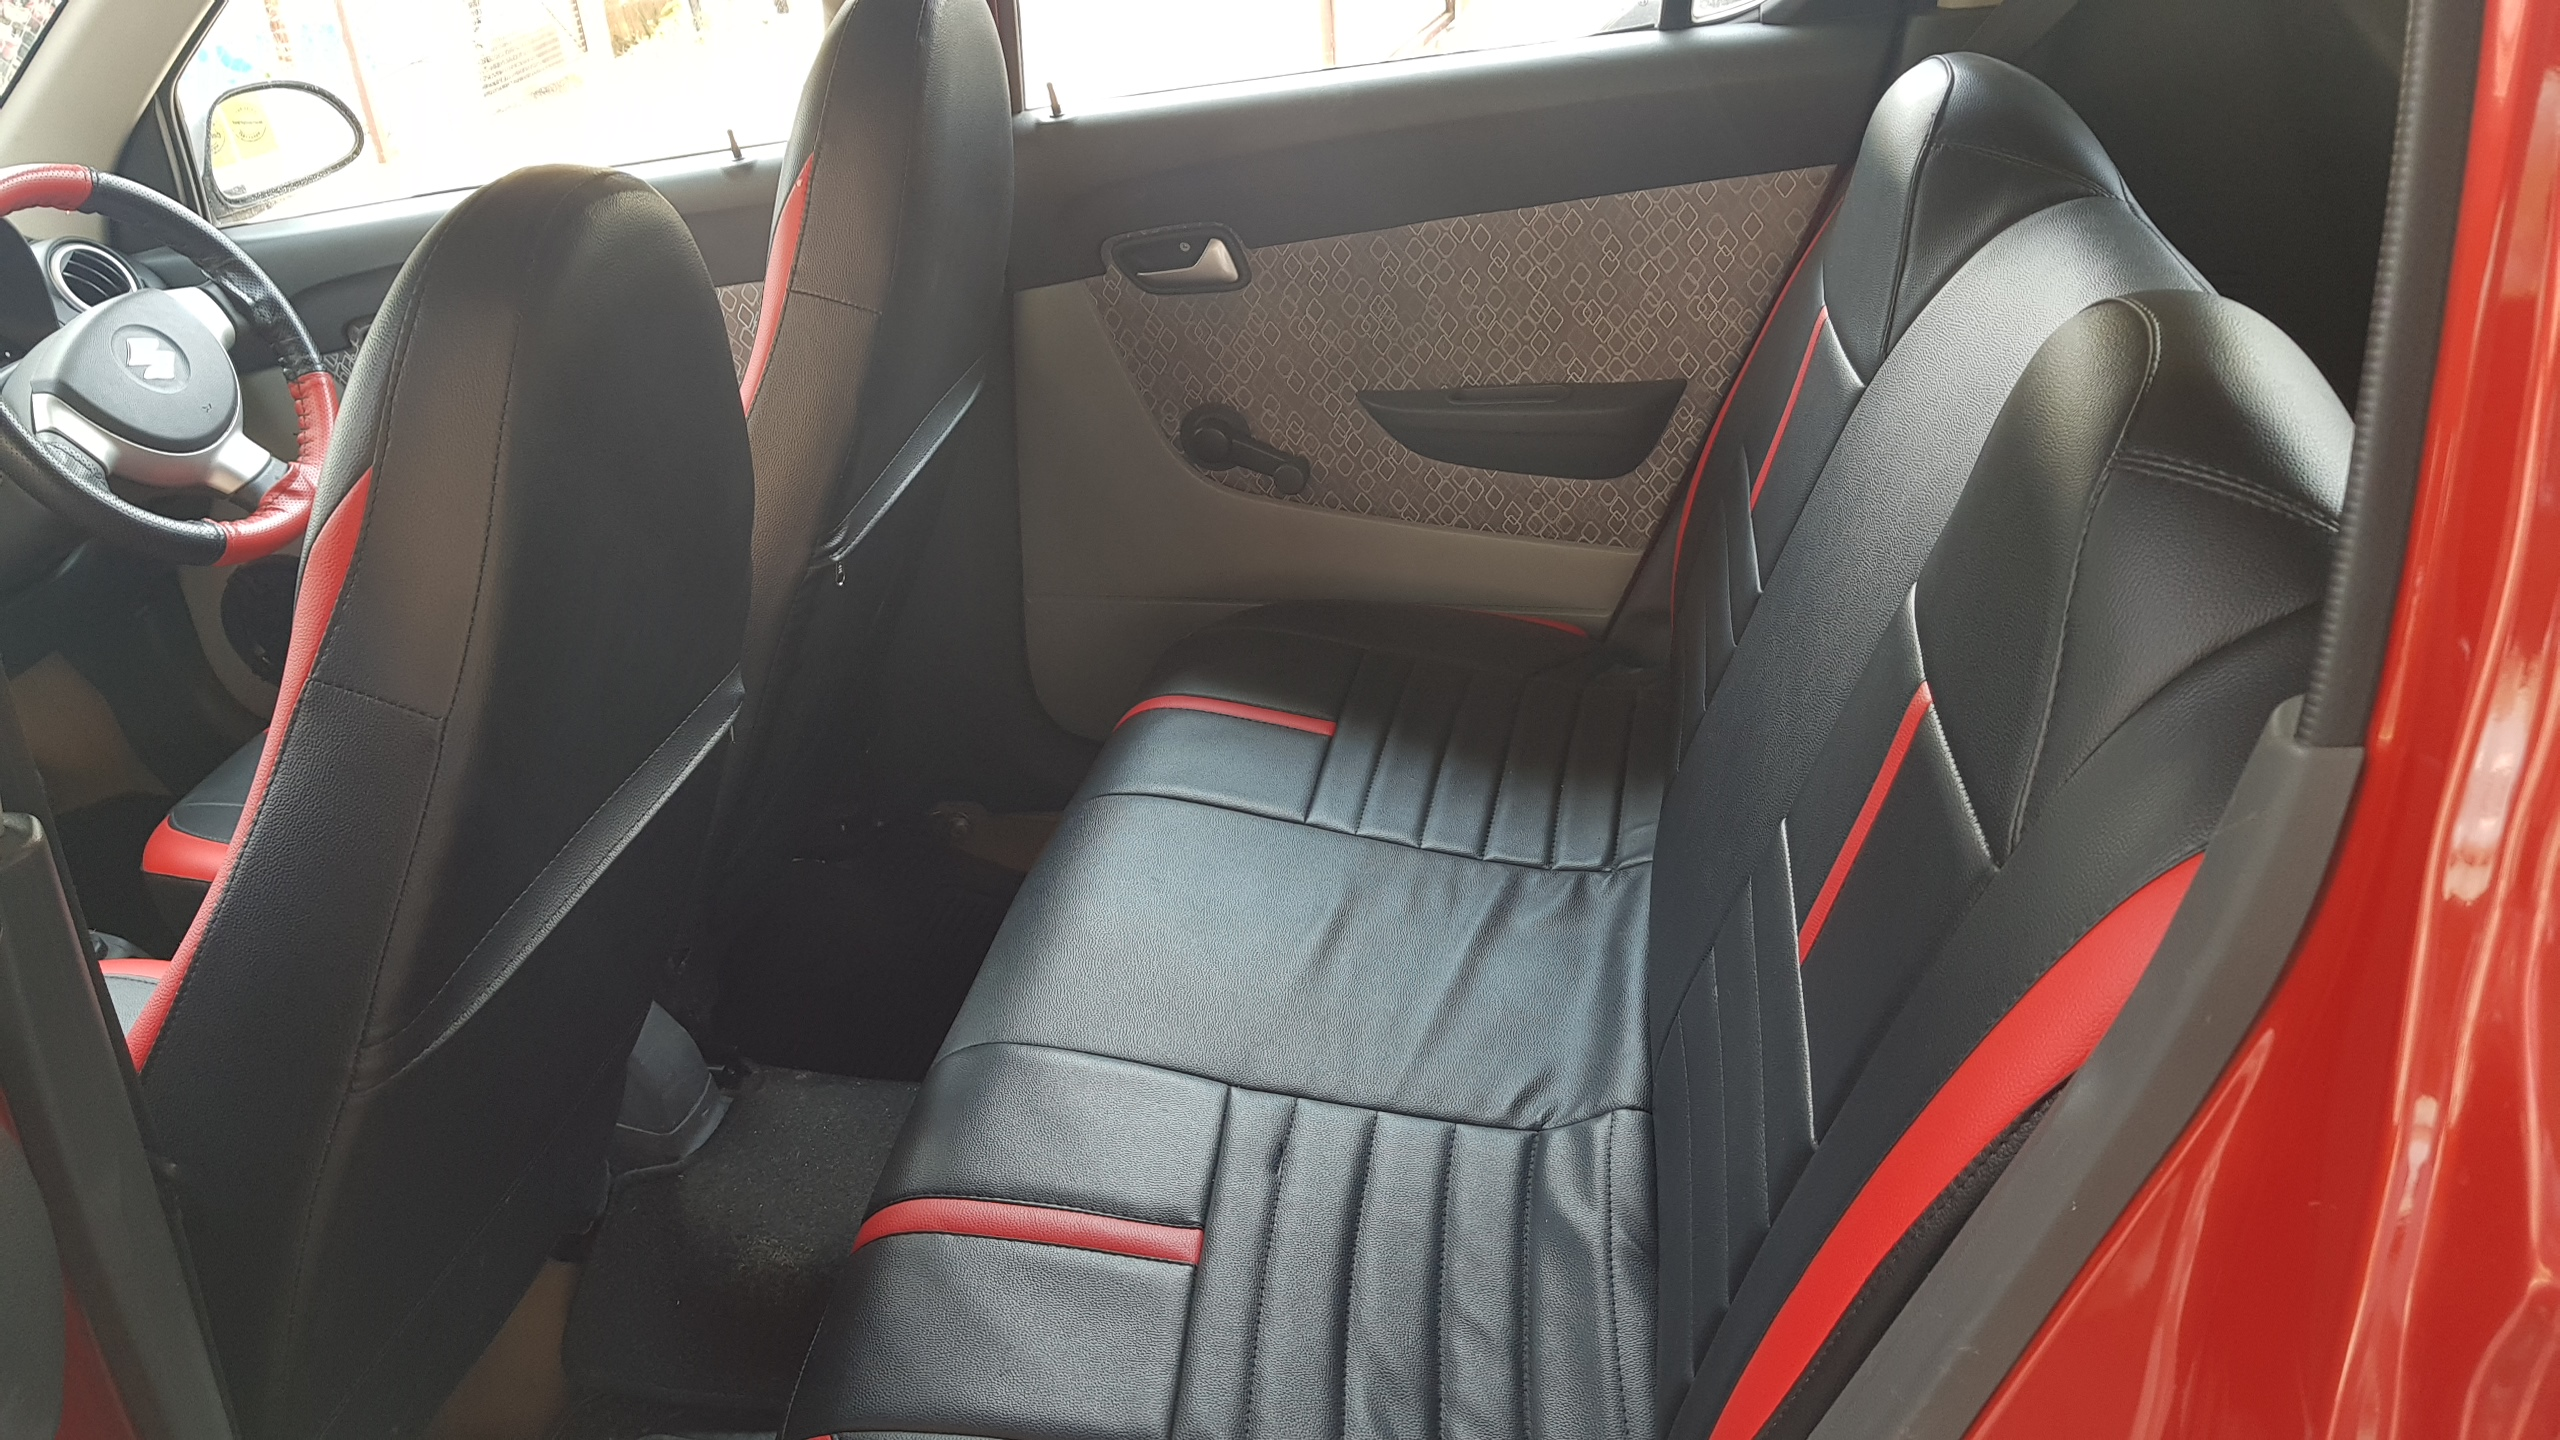 2016 Used Maruti Suzuki Alto 800 ALTO 800 LXI AIRBAG